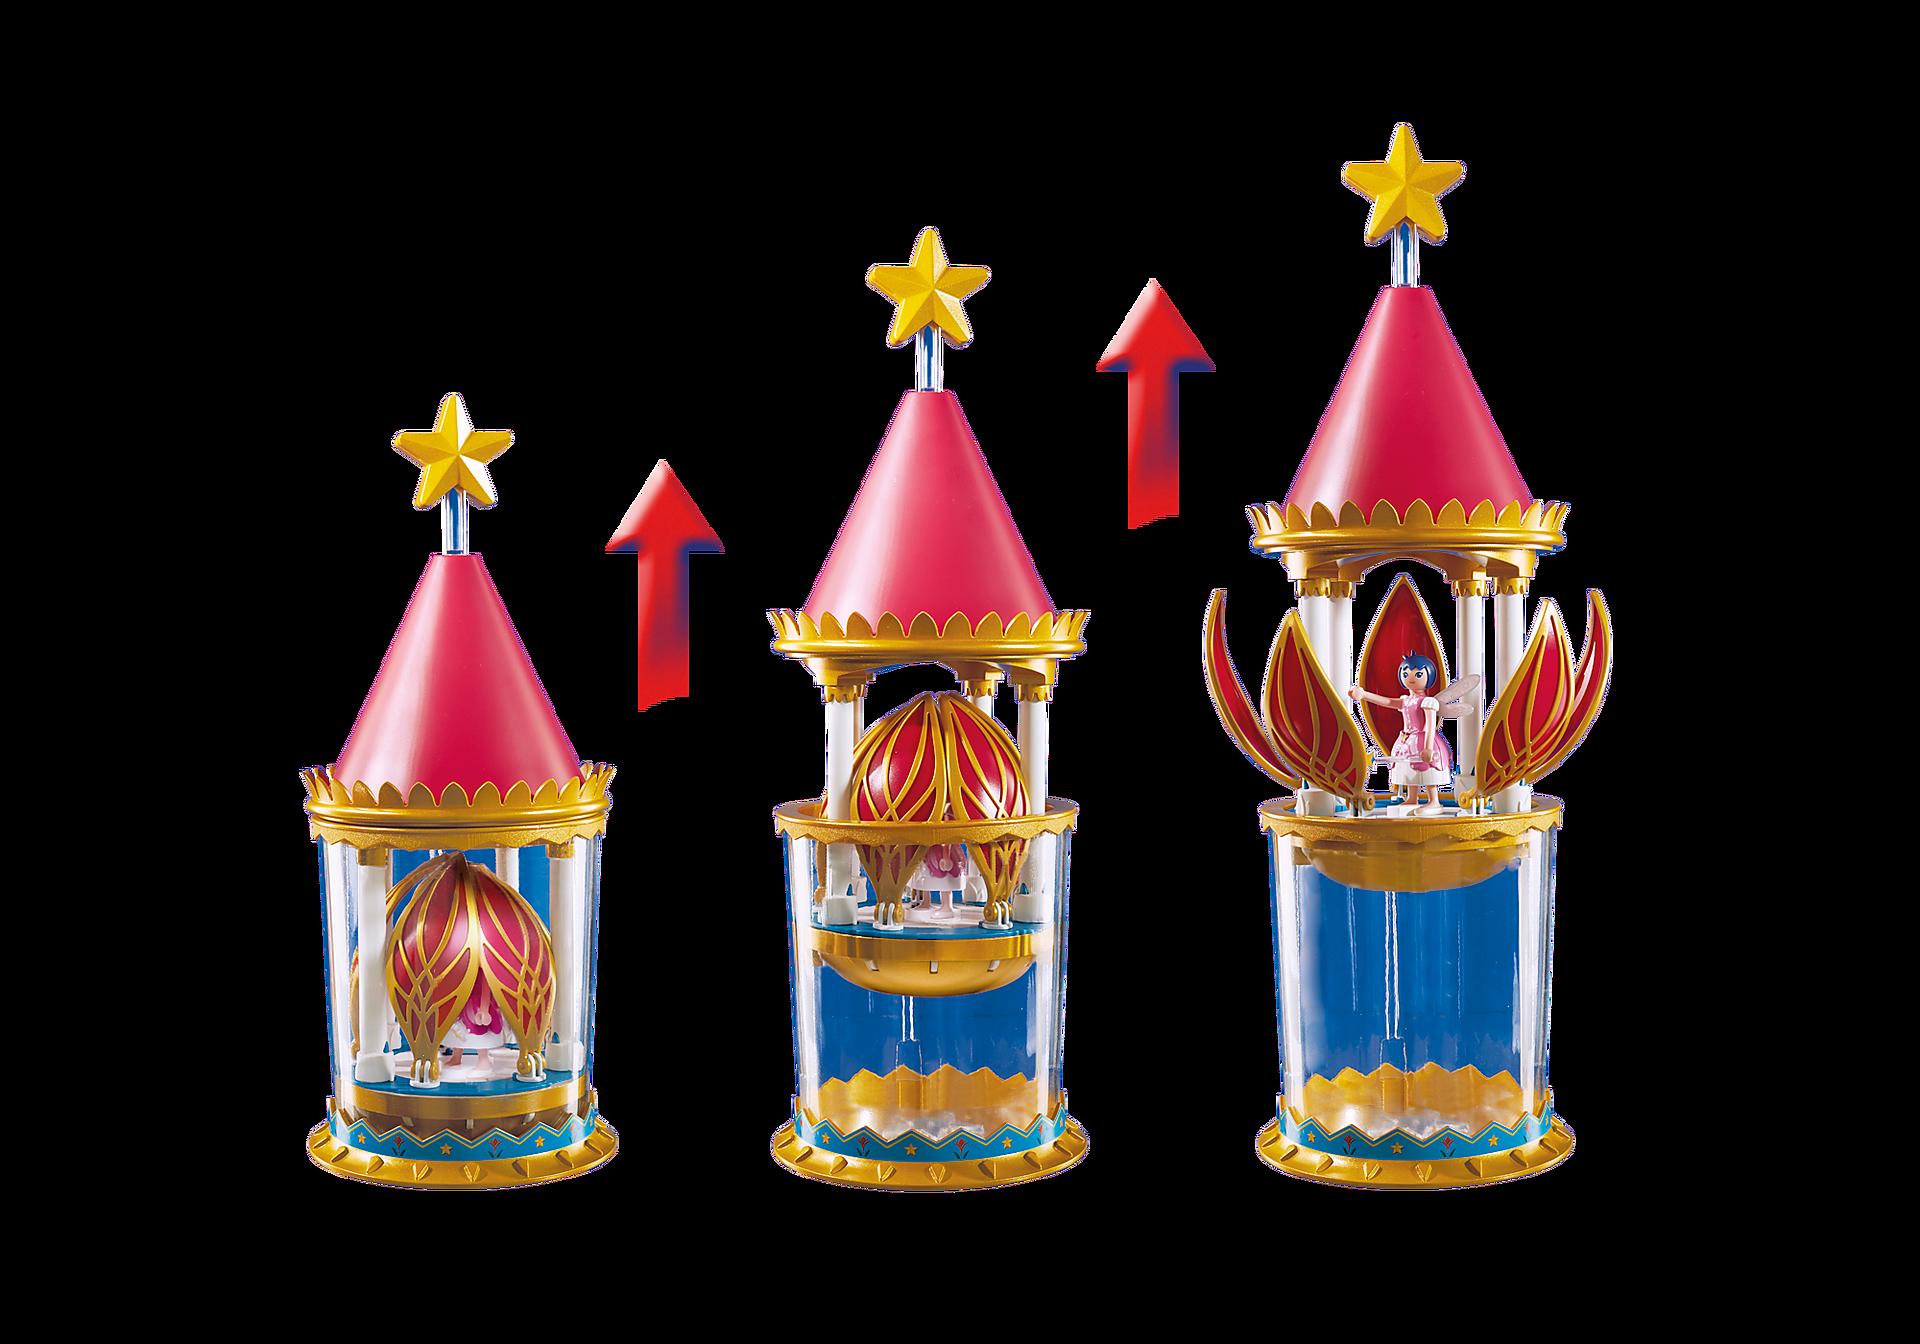 http://media.playmobil.com/i/playmobil/6688_product_extra4/Музыкальные Цветочная Башня с Твинкл